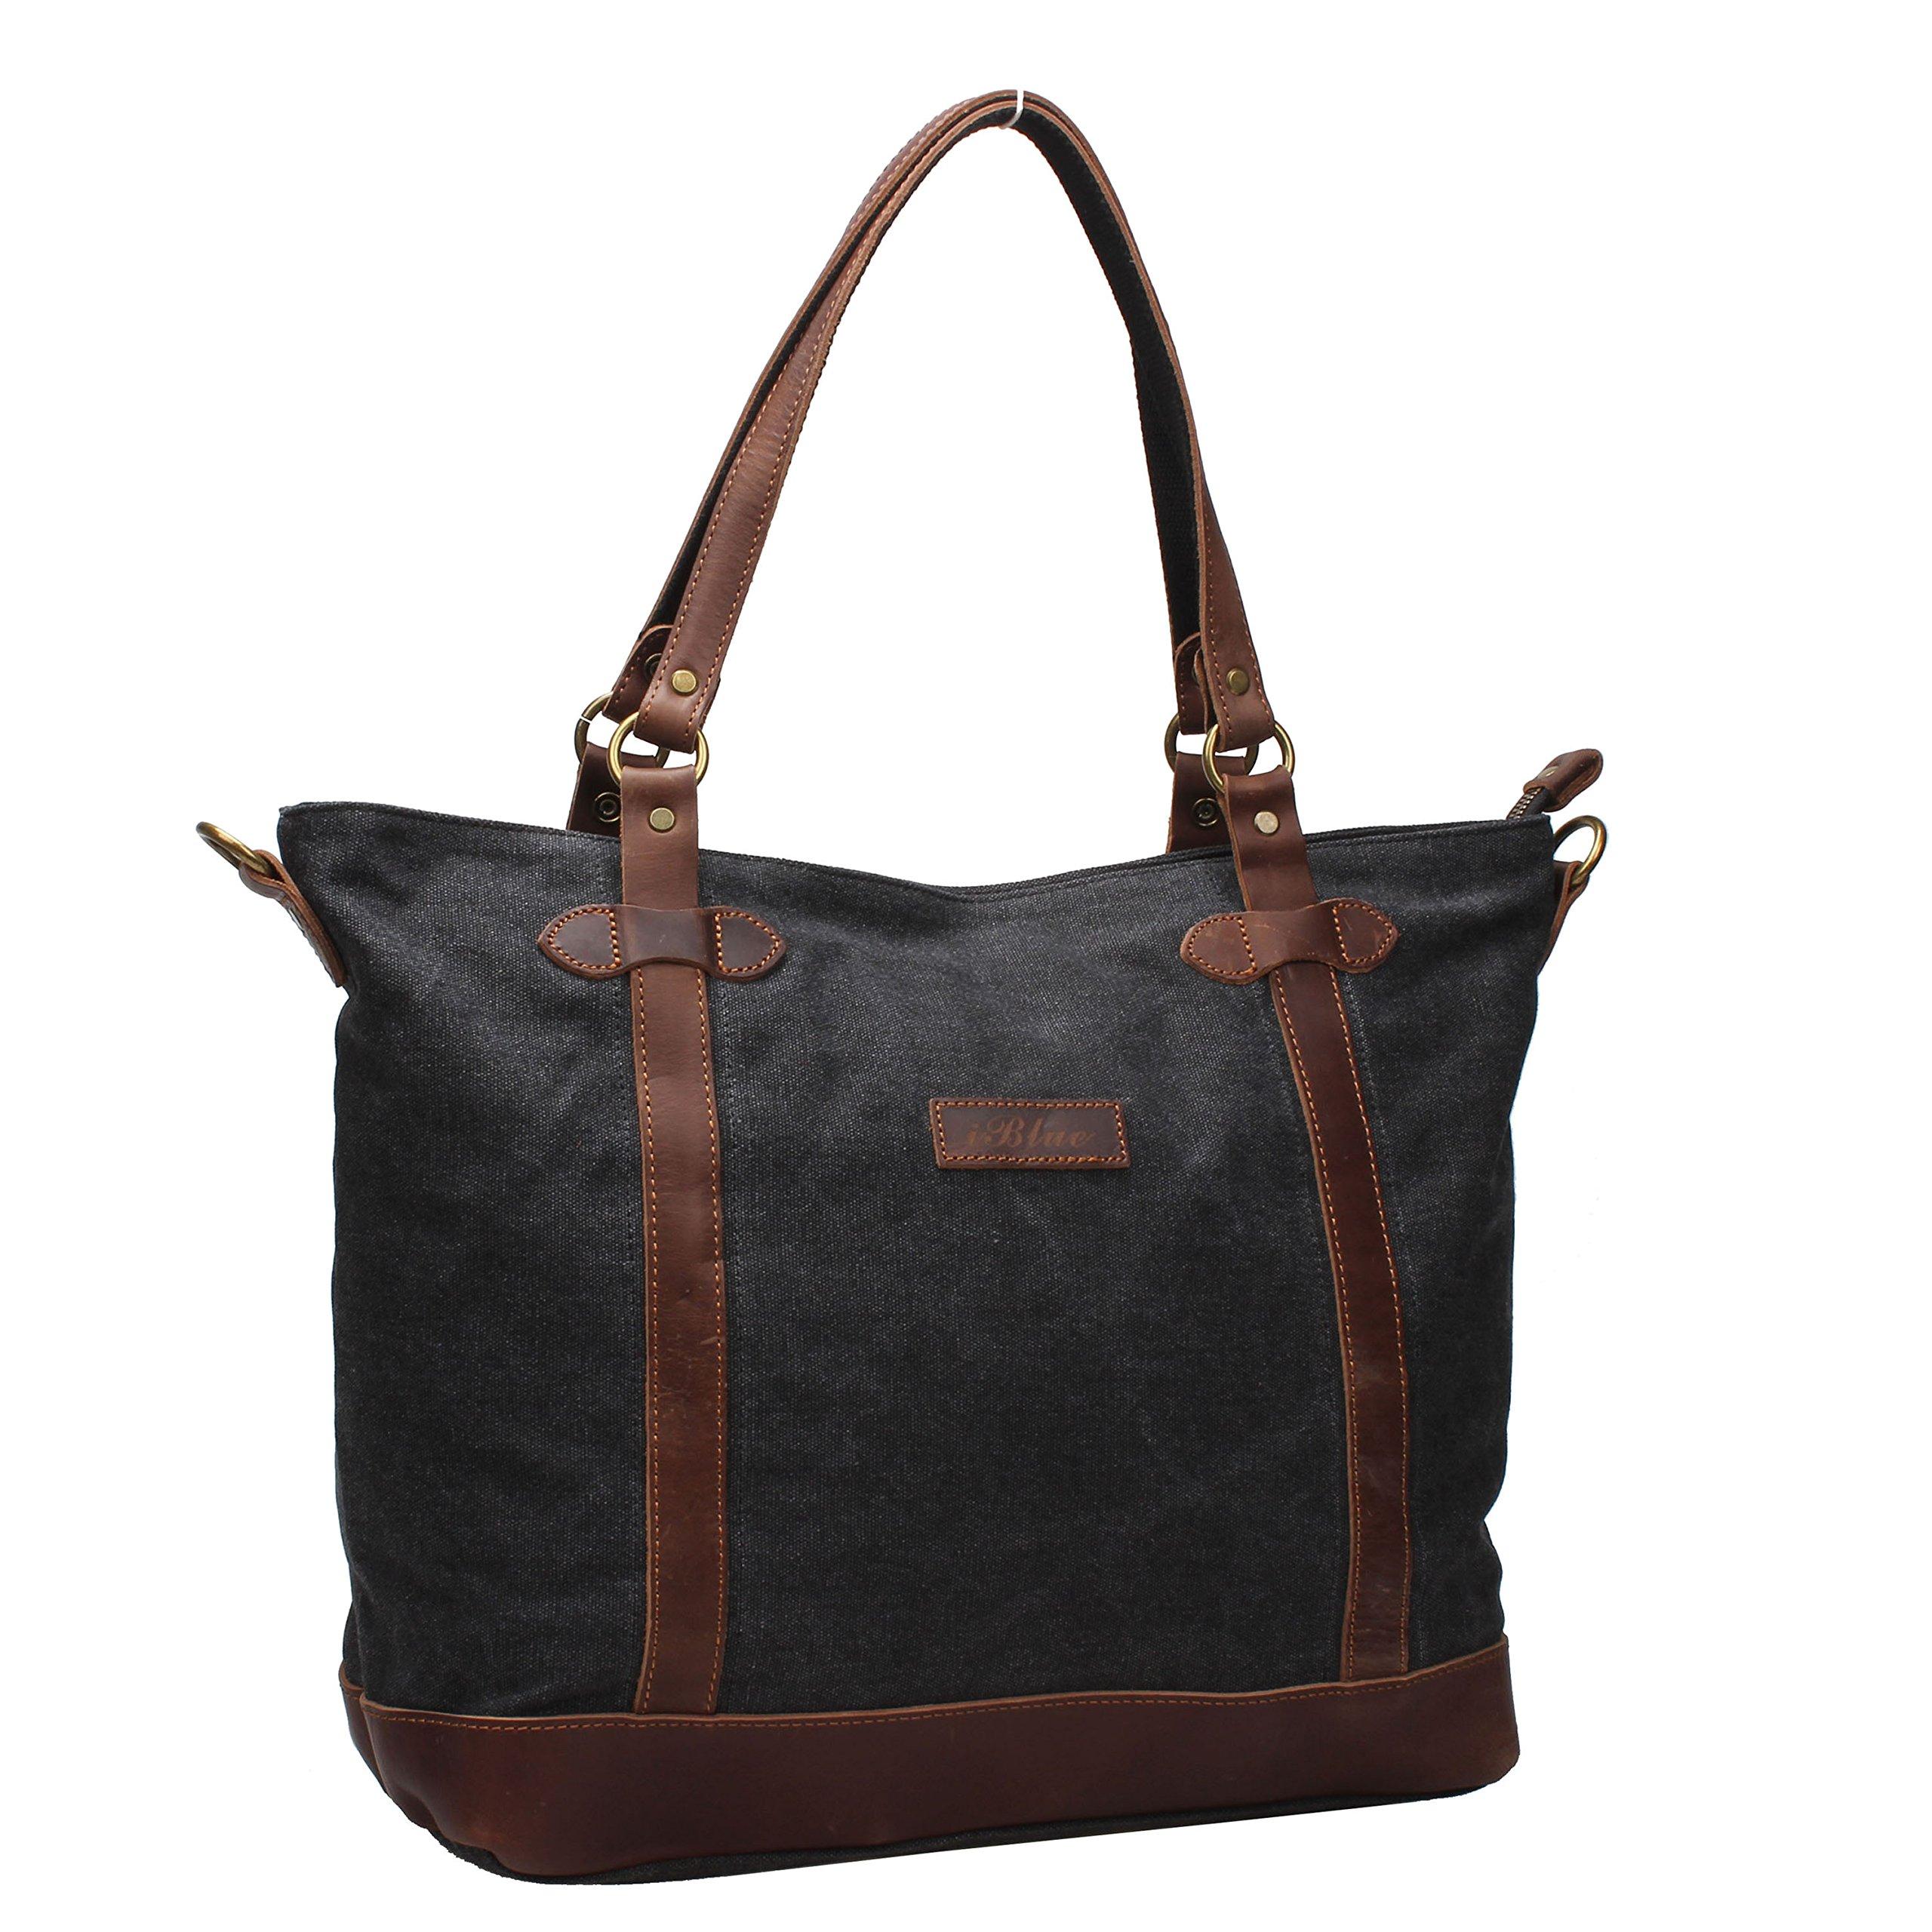 Iblue Women Canvas Shoulder Crossbody Bag Top Handle Handbag Grey i520